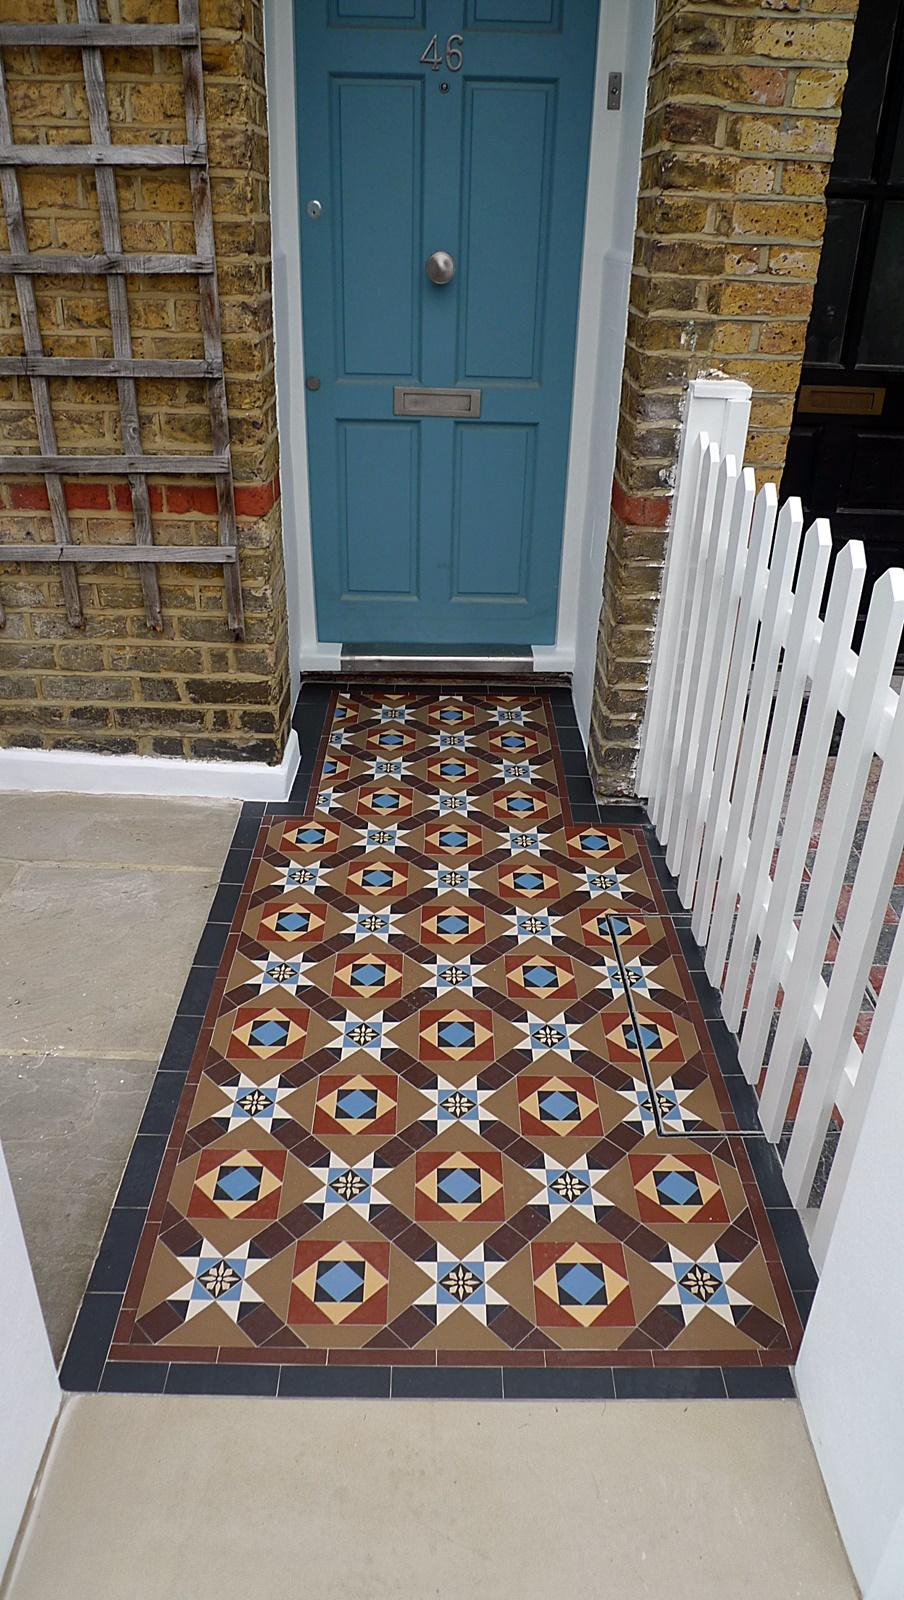 bowood 50 victroian mosaic tile path london wandsworth battersea clapham balham dulwich london